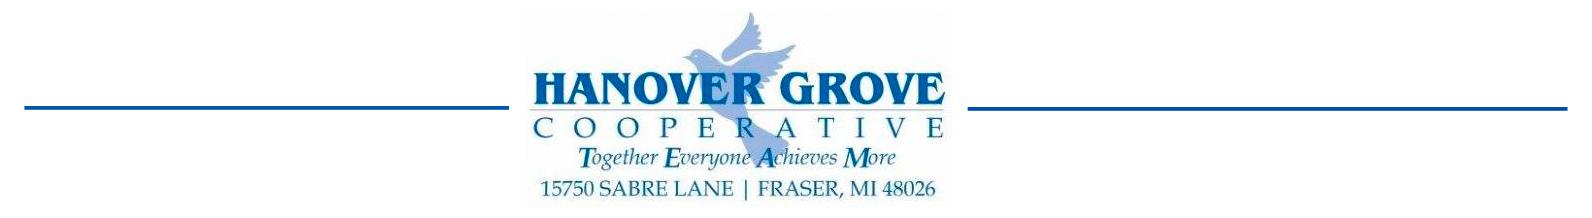 Hanover Grove Cooperative